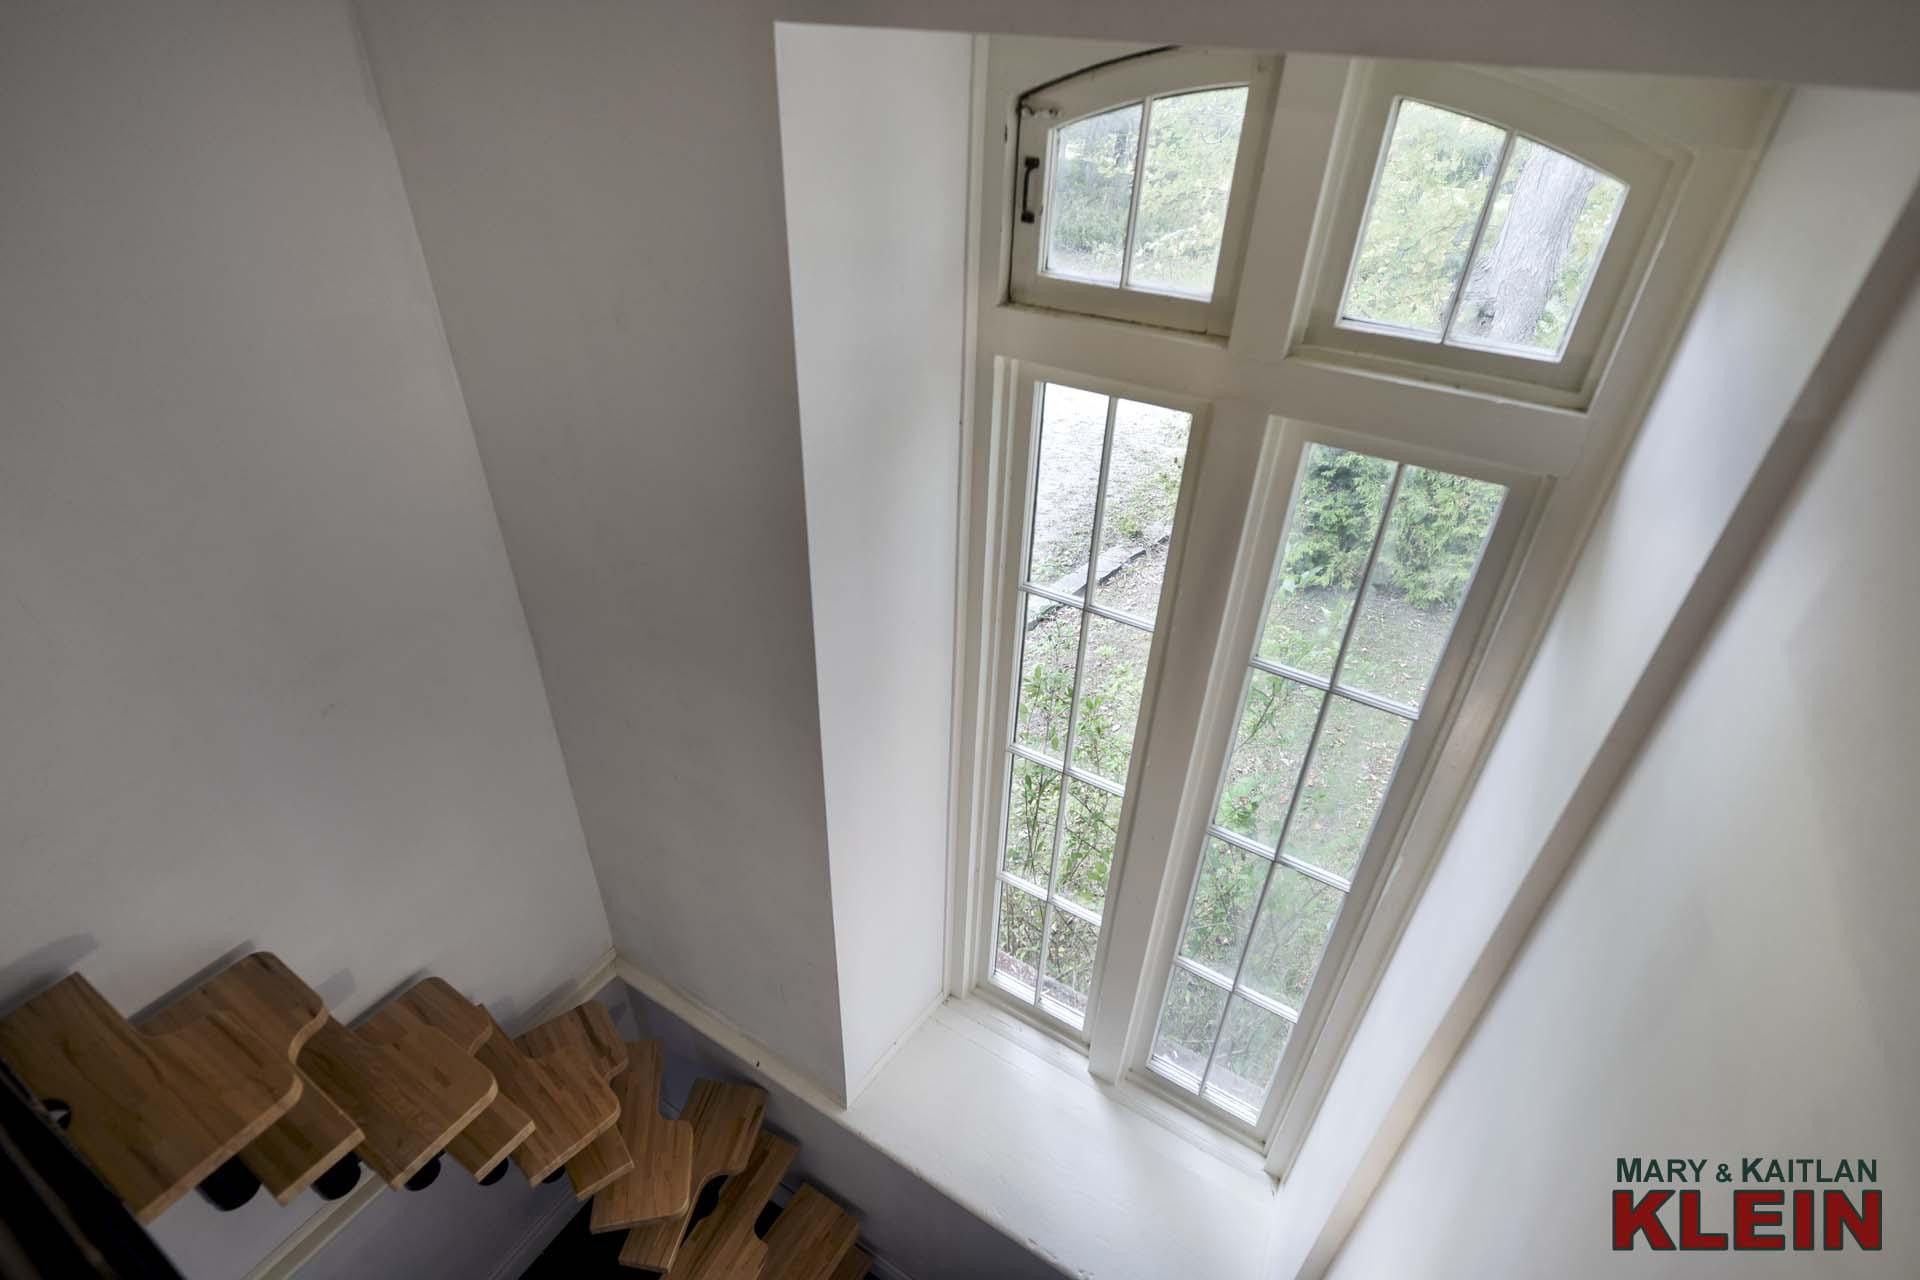 Beachwood Staircase to Loft Area